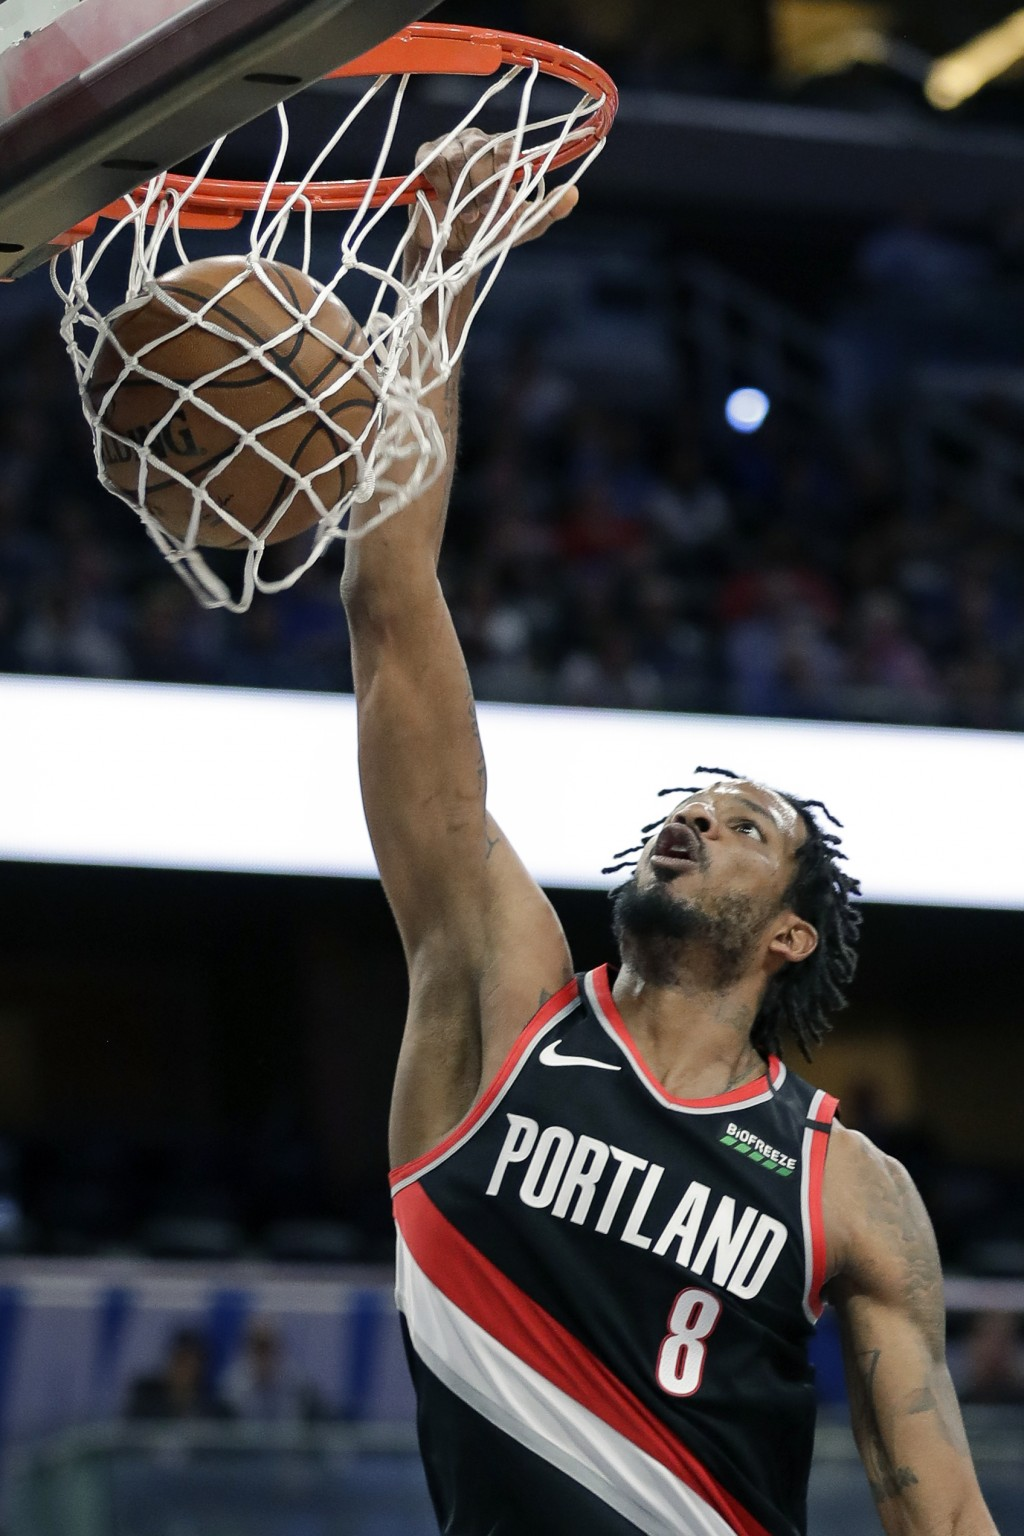 Portland Trail Blazers forward Trevor Ariza makes an uncontested dunk against the Orlando Magic during the first half of an NBA basketball game, Monda...